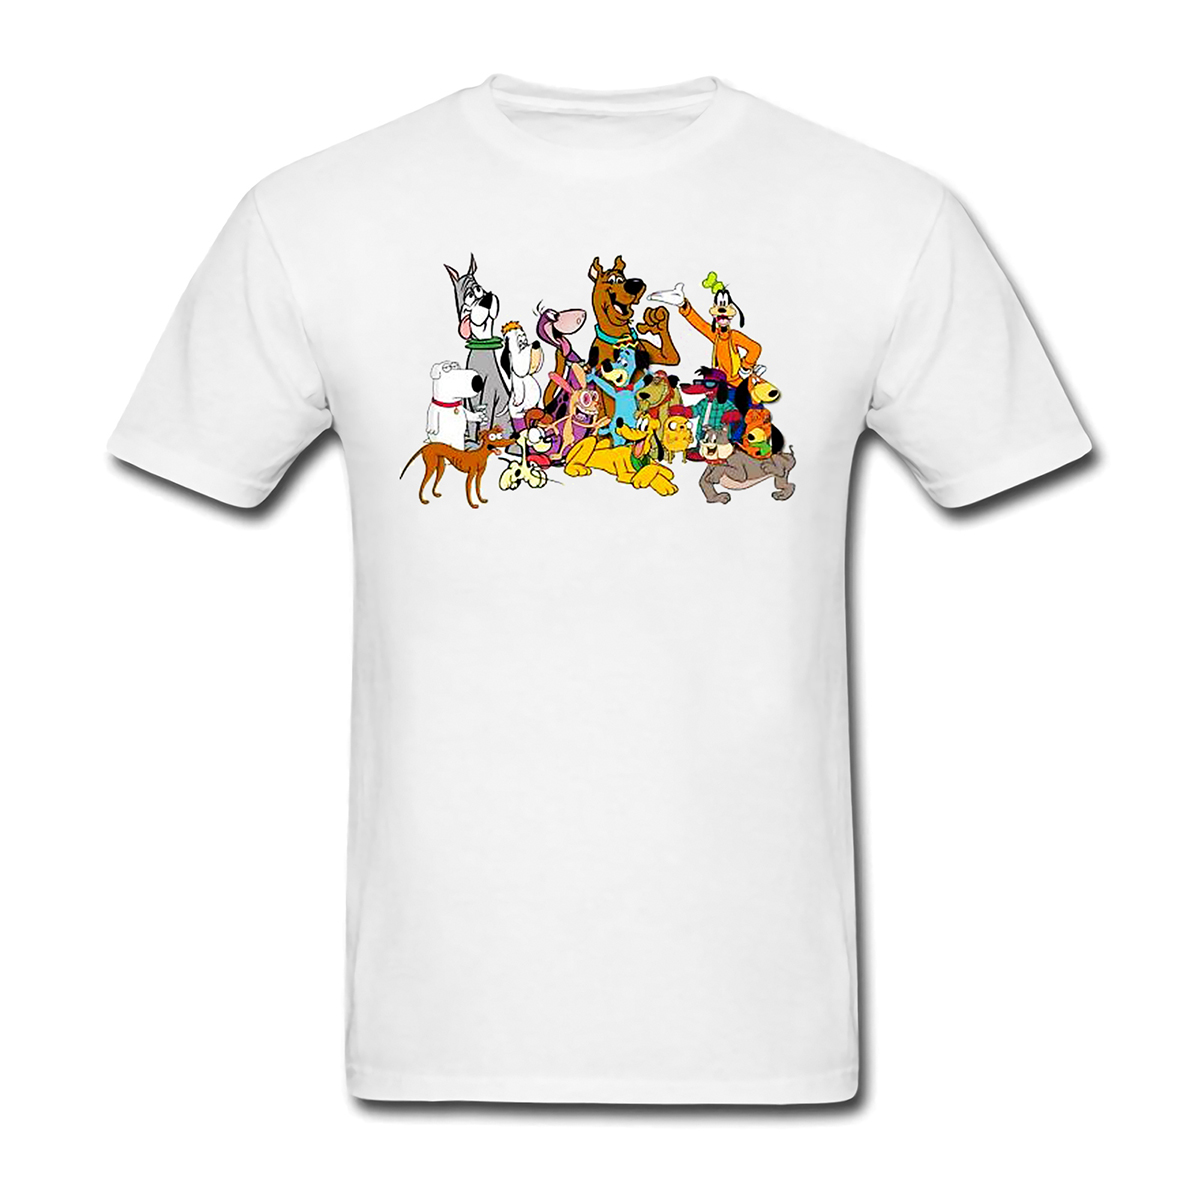 Dog Scooby mimics cartoon short sleeve T-shirt for men and women